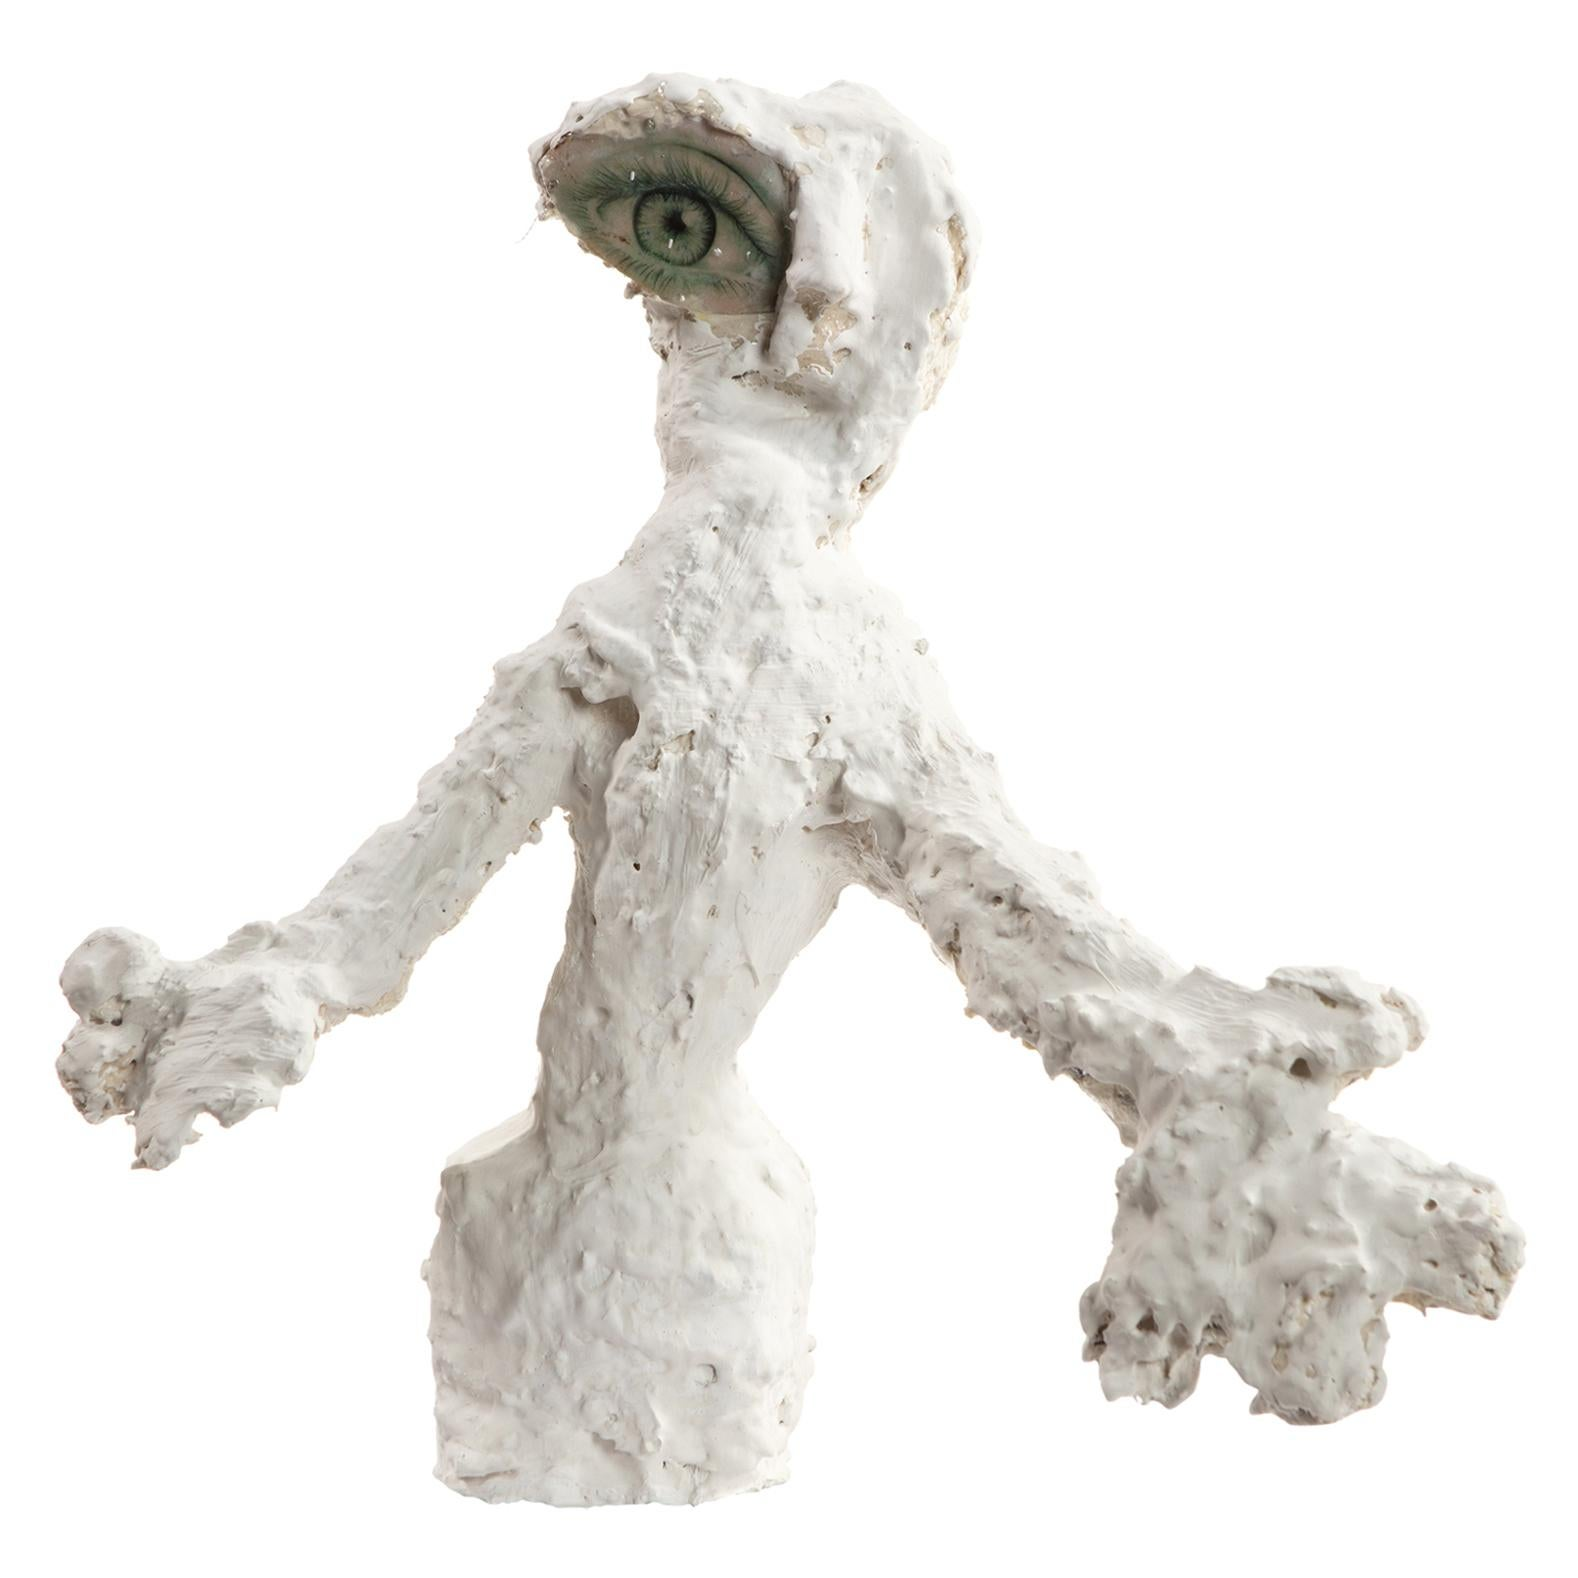 White Plaster Sculpture Man Figure, 21st Century by Mattia Biagi